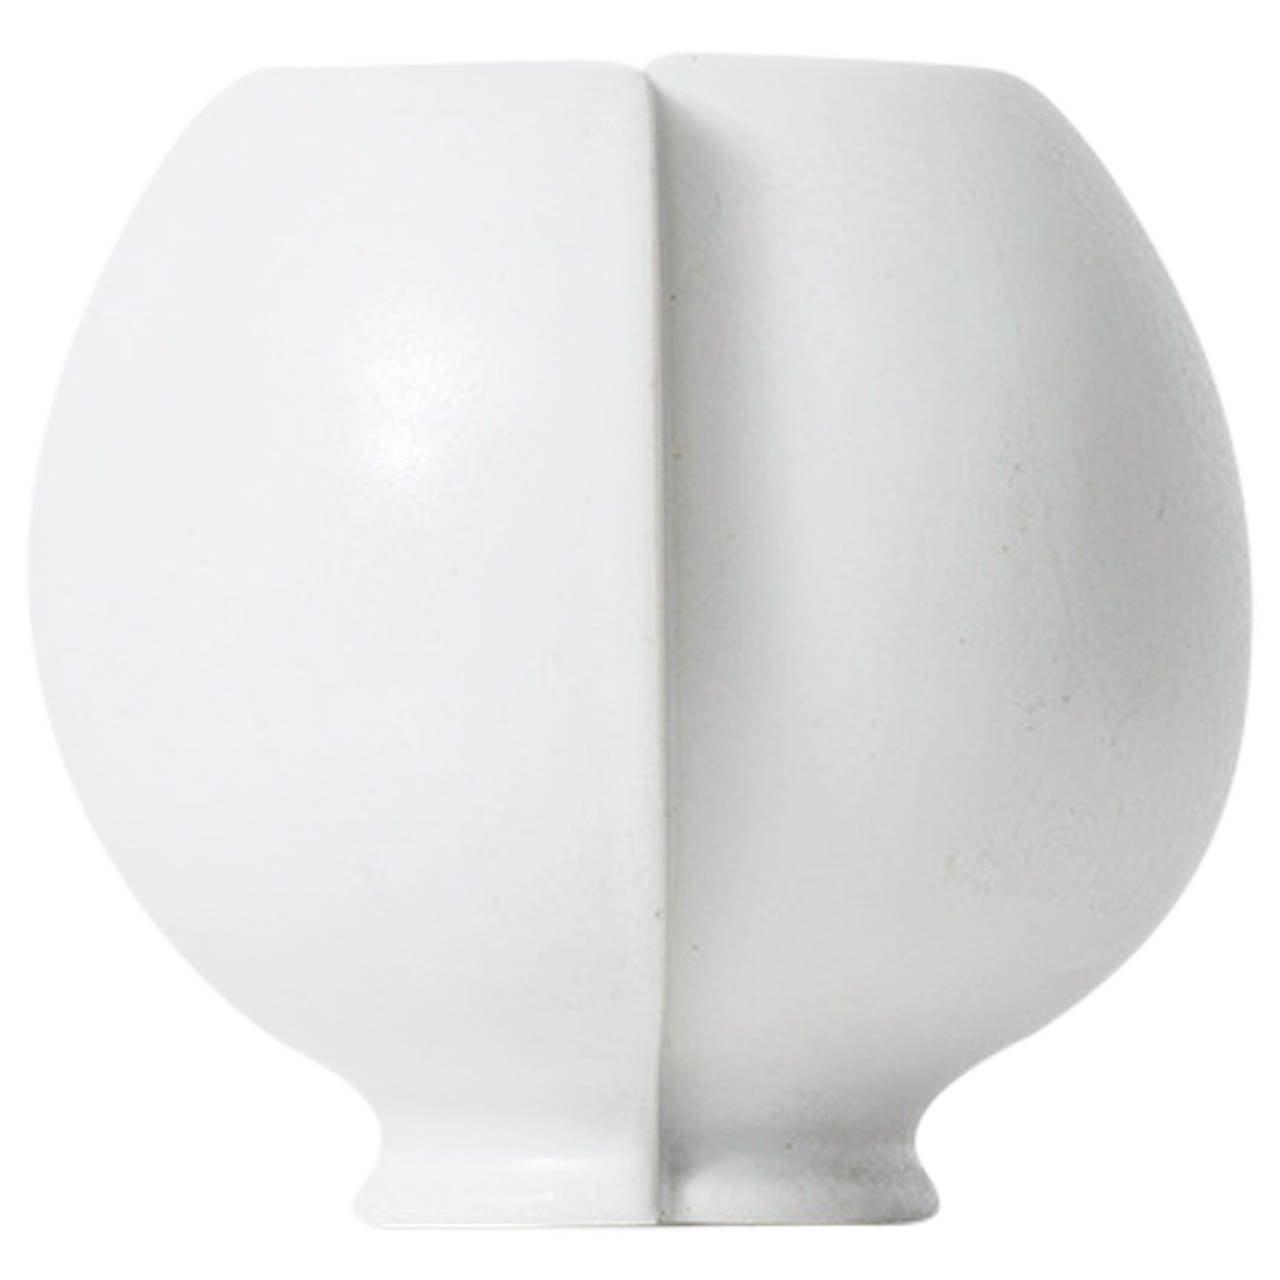 Wilhelm Kåge Ceramic Vase Model Surrea by Gustavsberg in Sweden